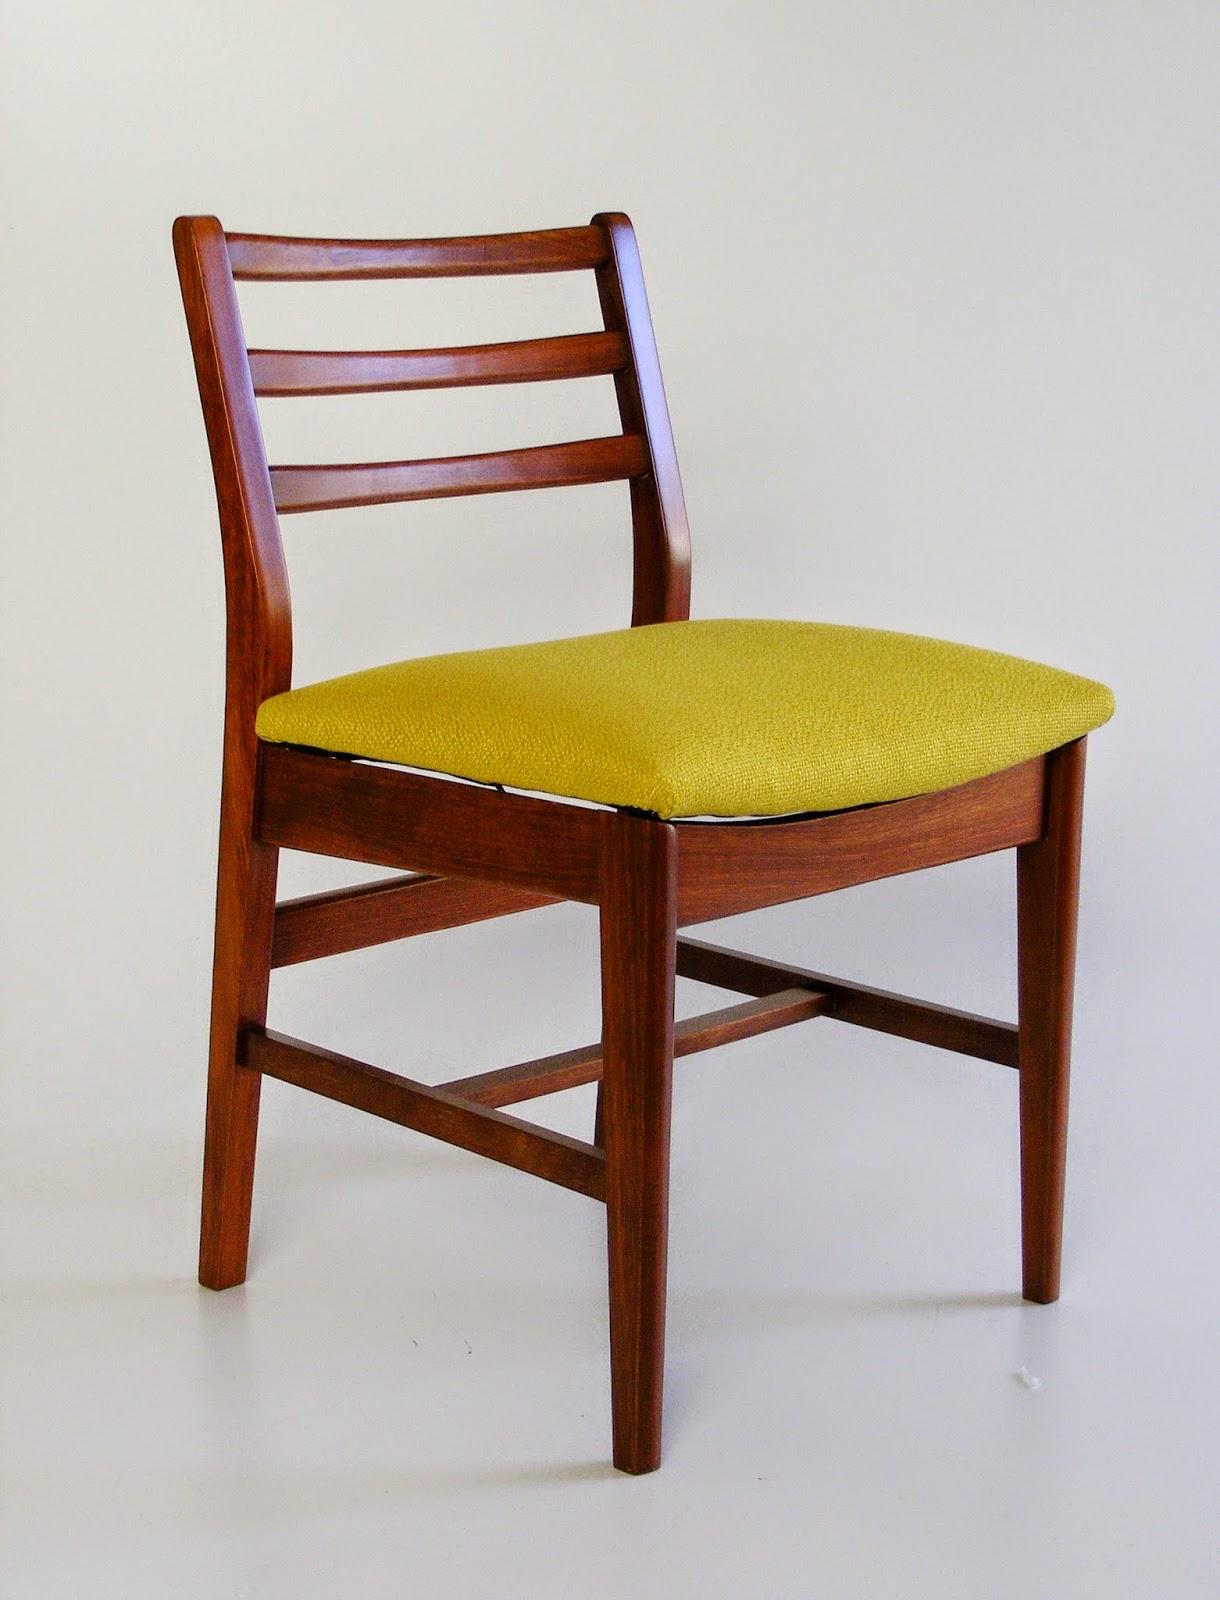 VAMP FURNITURE This weeks new vintage furniture stock